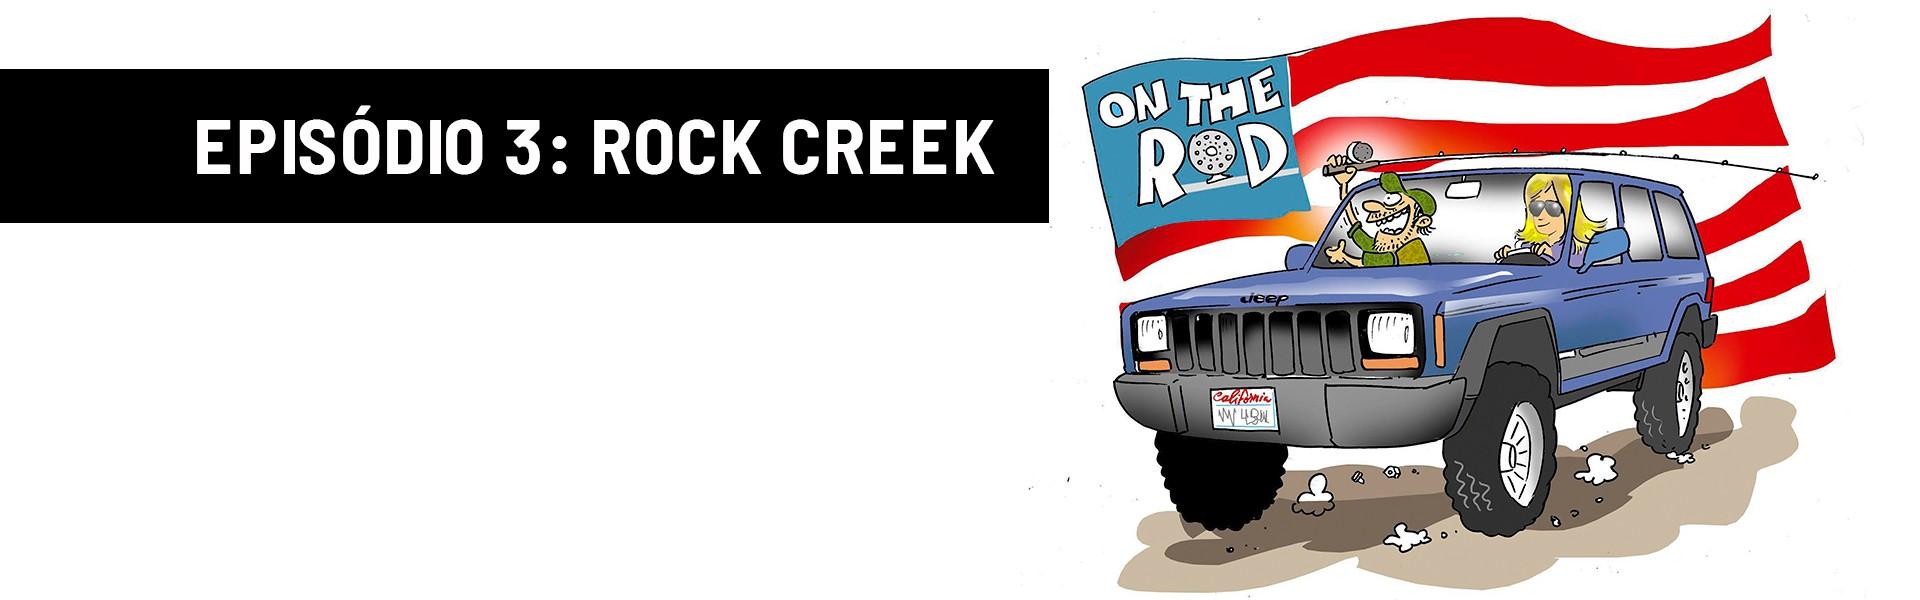 On The Rod - Rock Creek